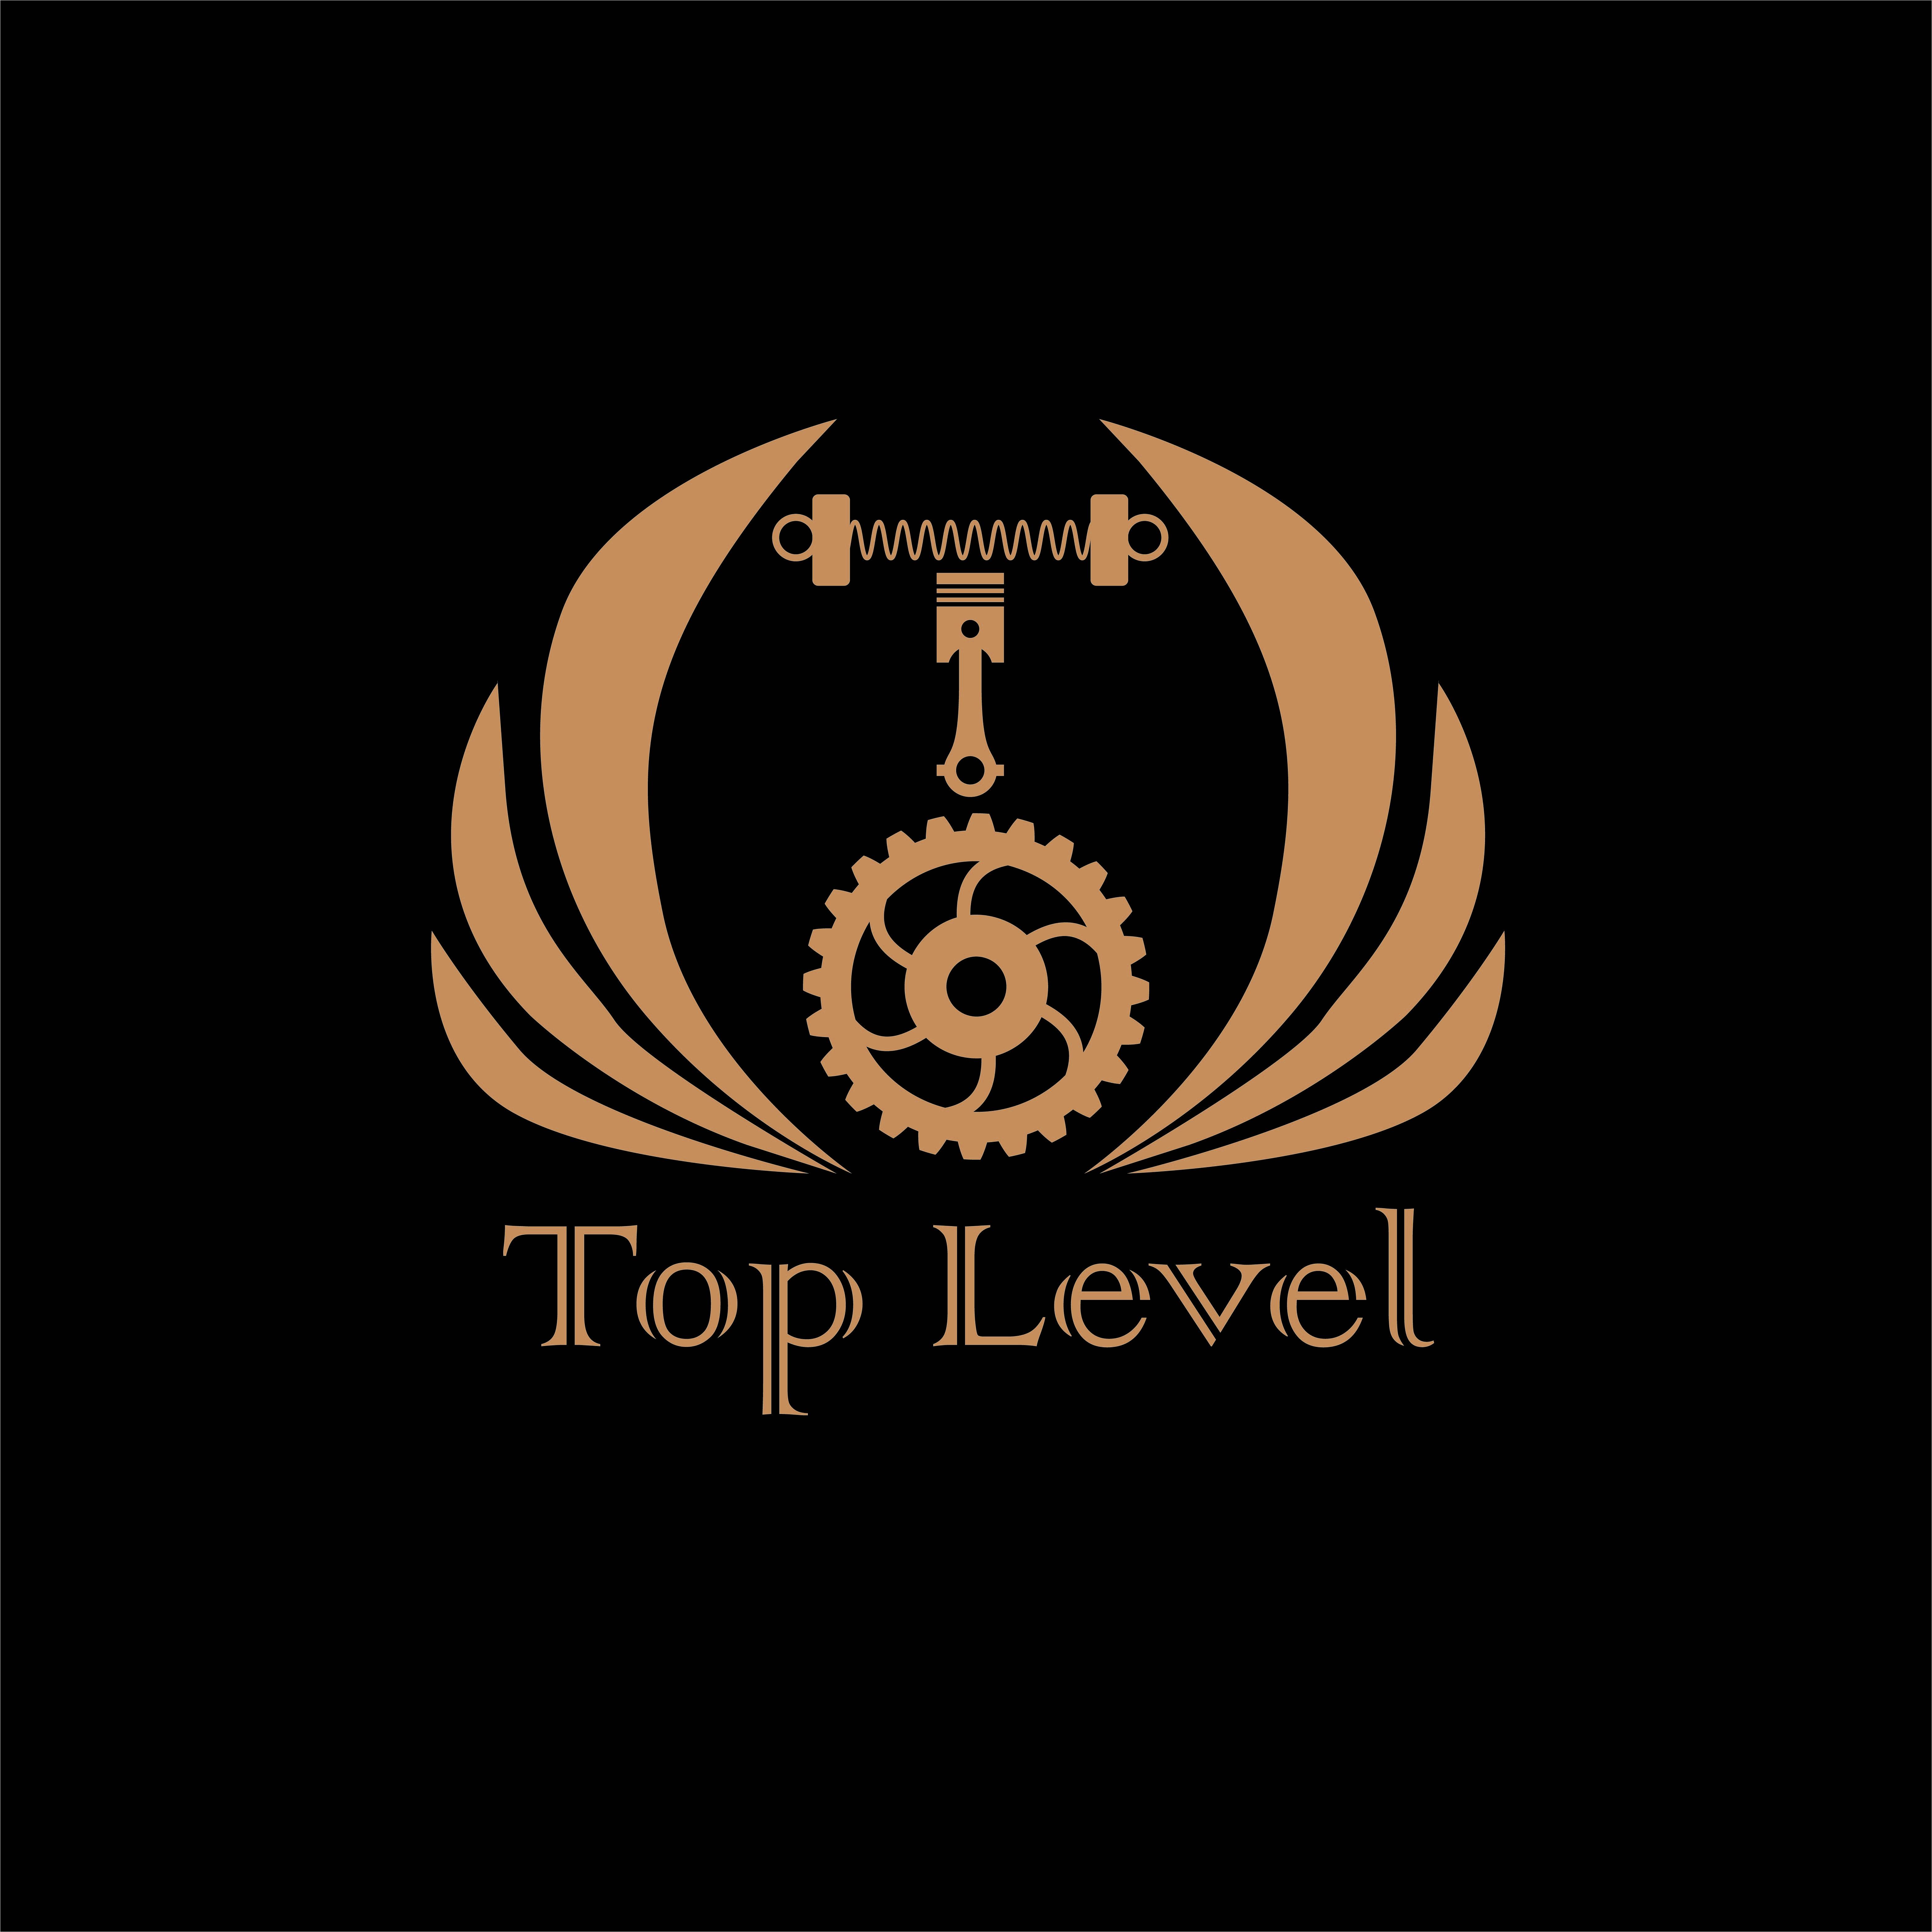 Разработка логотипа для тюнинг ателье фото f_0435f45ba3ae0f3c.jpg